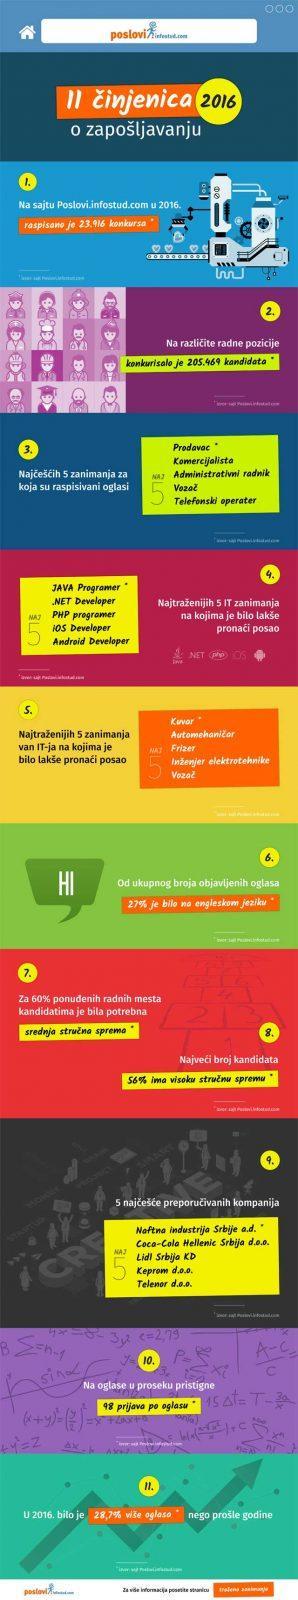 infografik_infostud